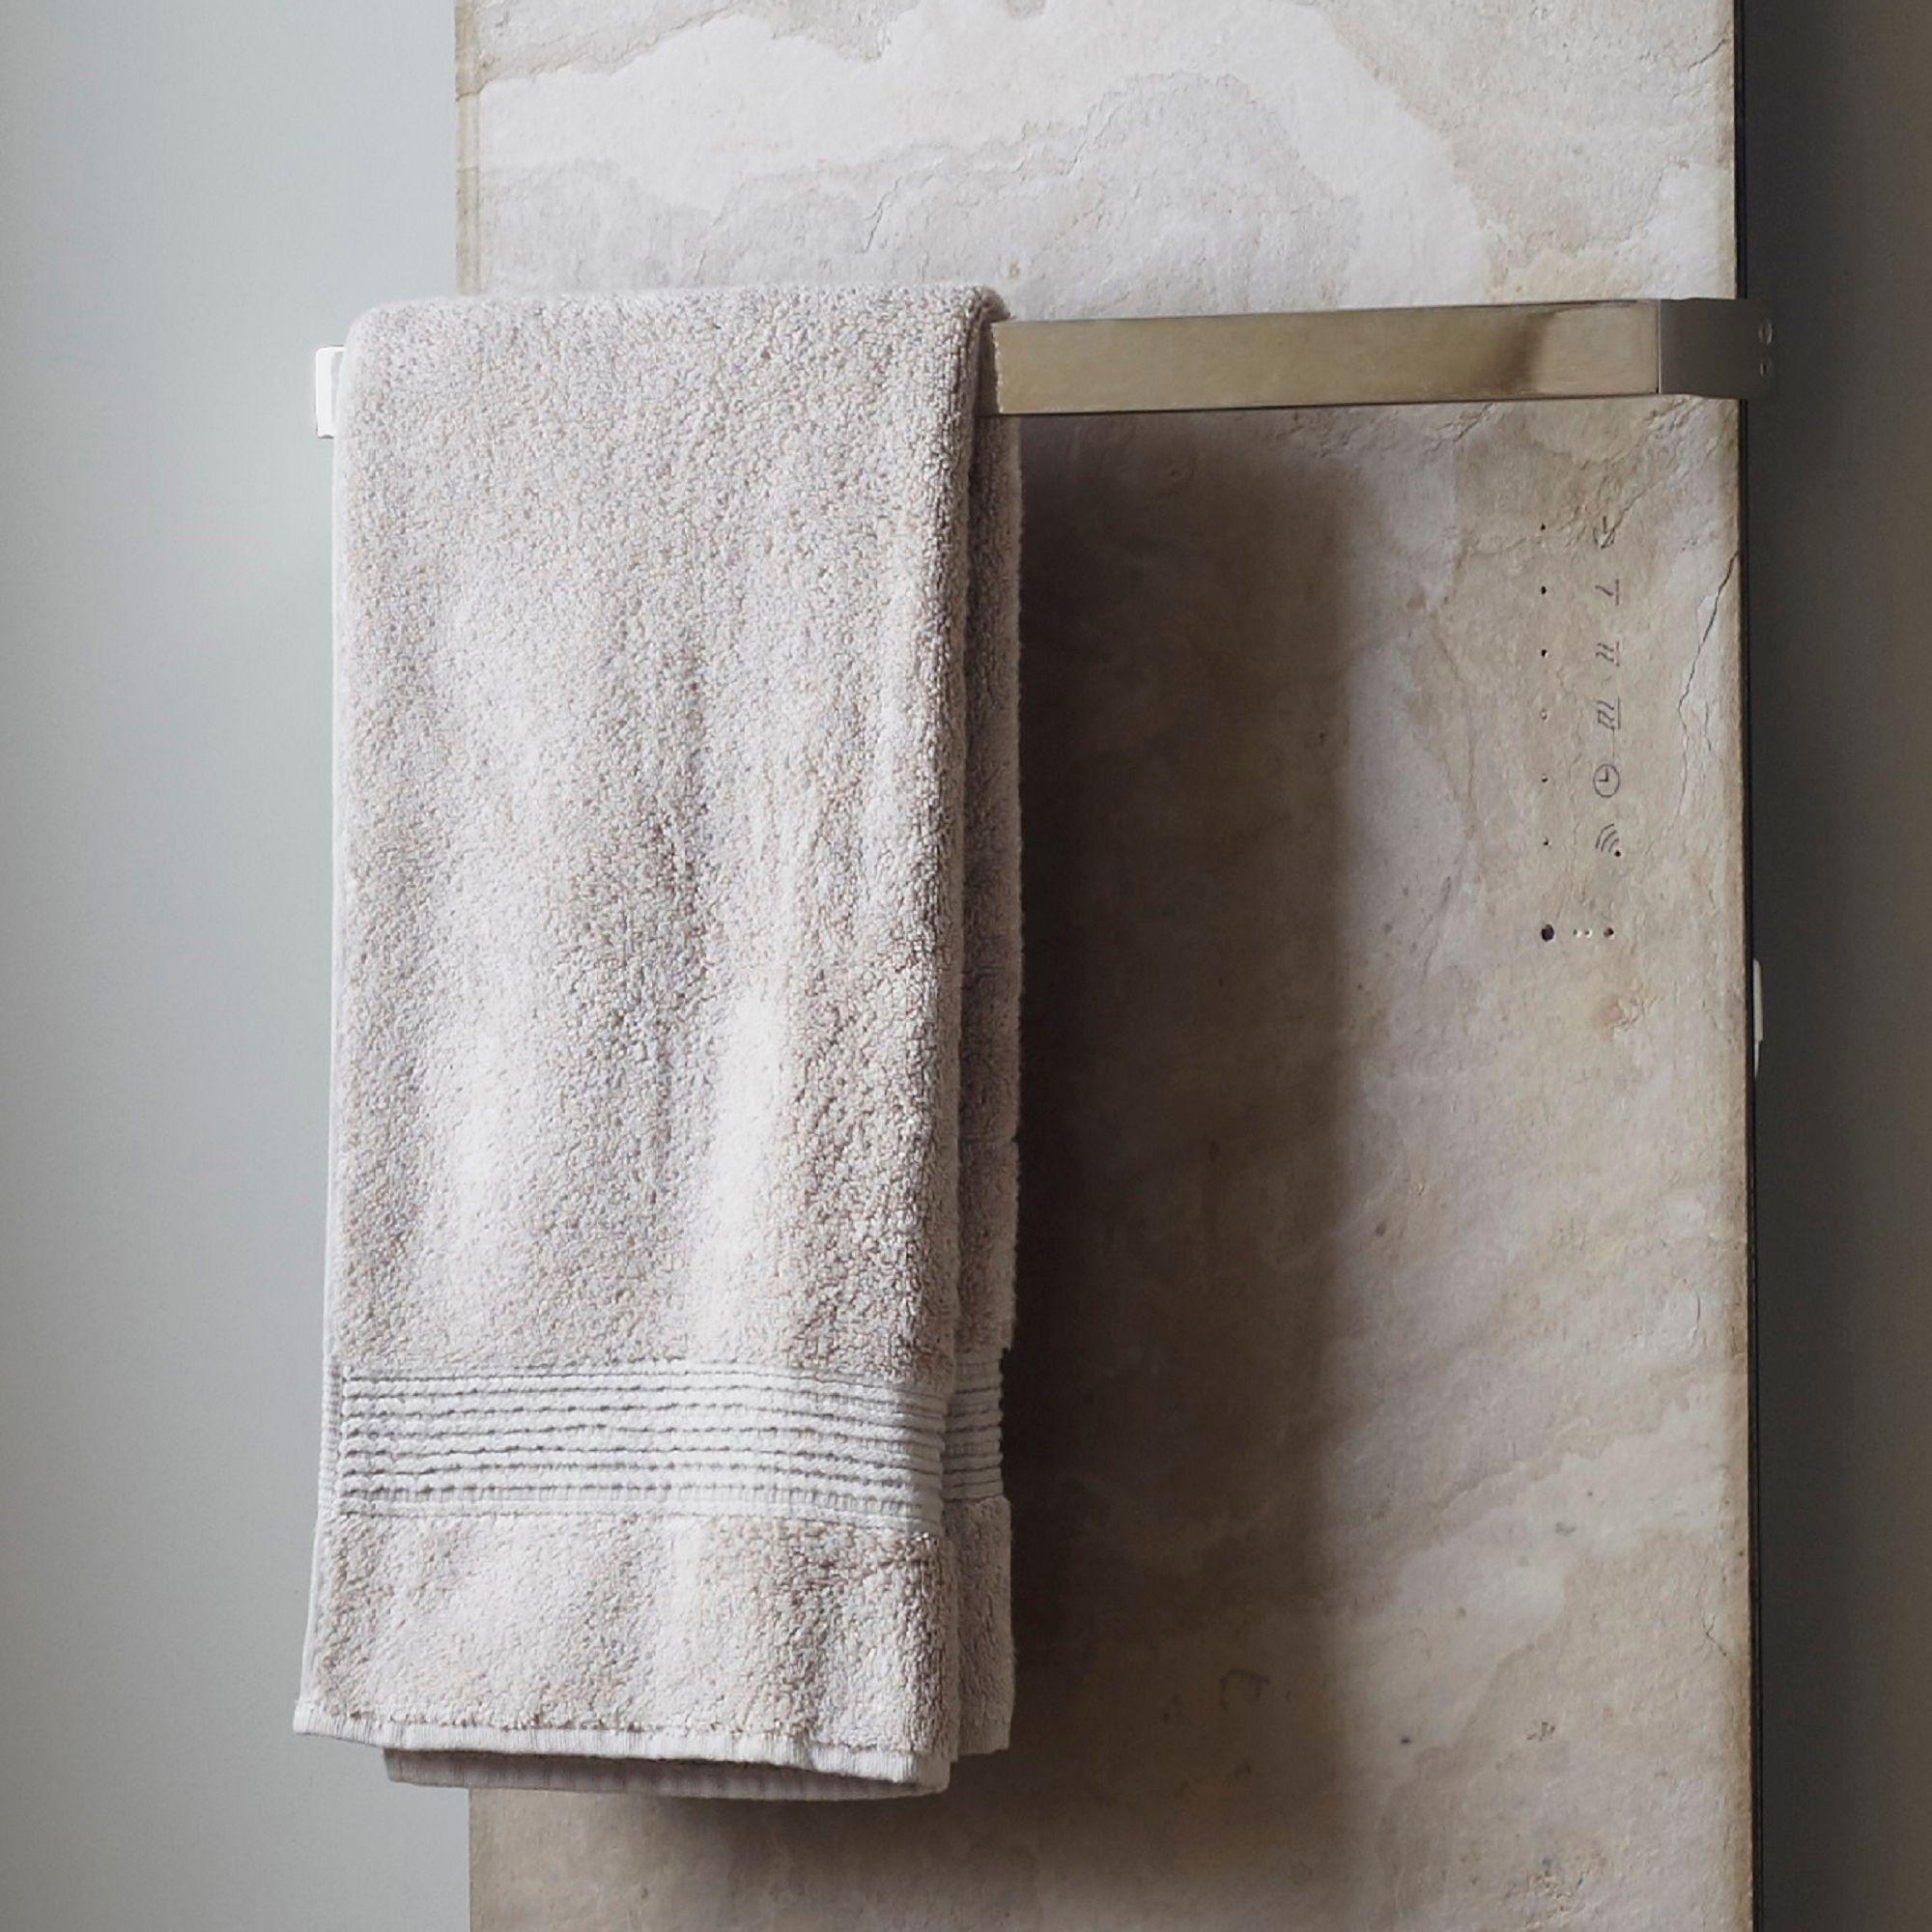 Polished Vetro towel bar (H)20mm (W)520mm (D)90mm